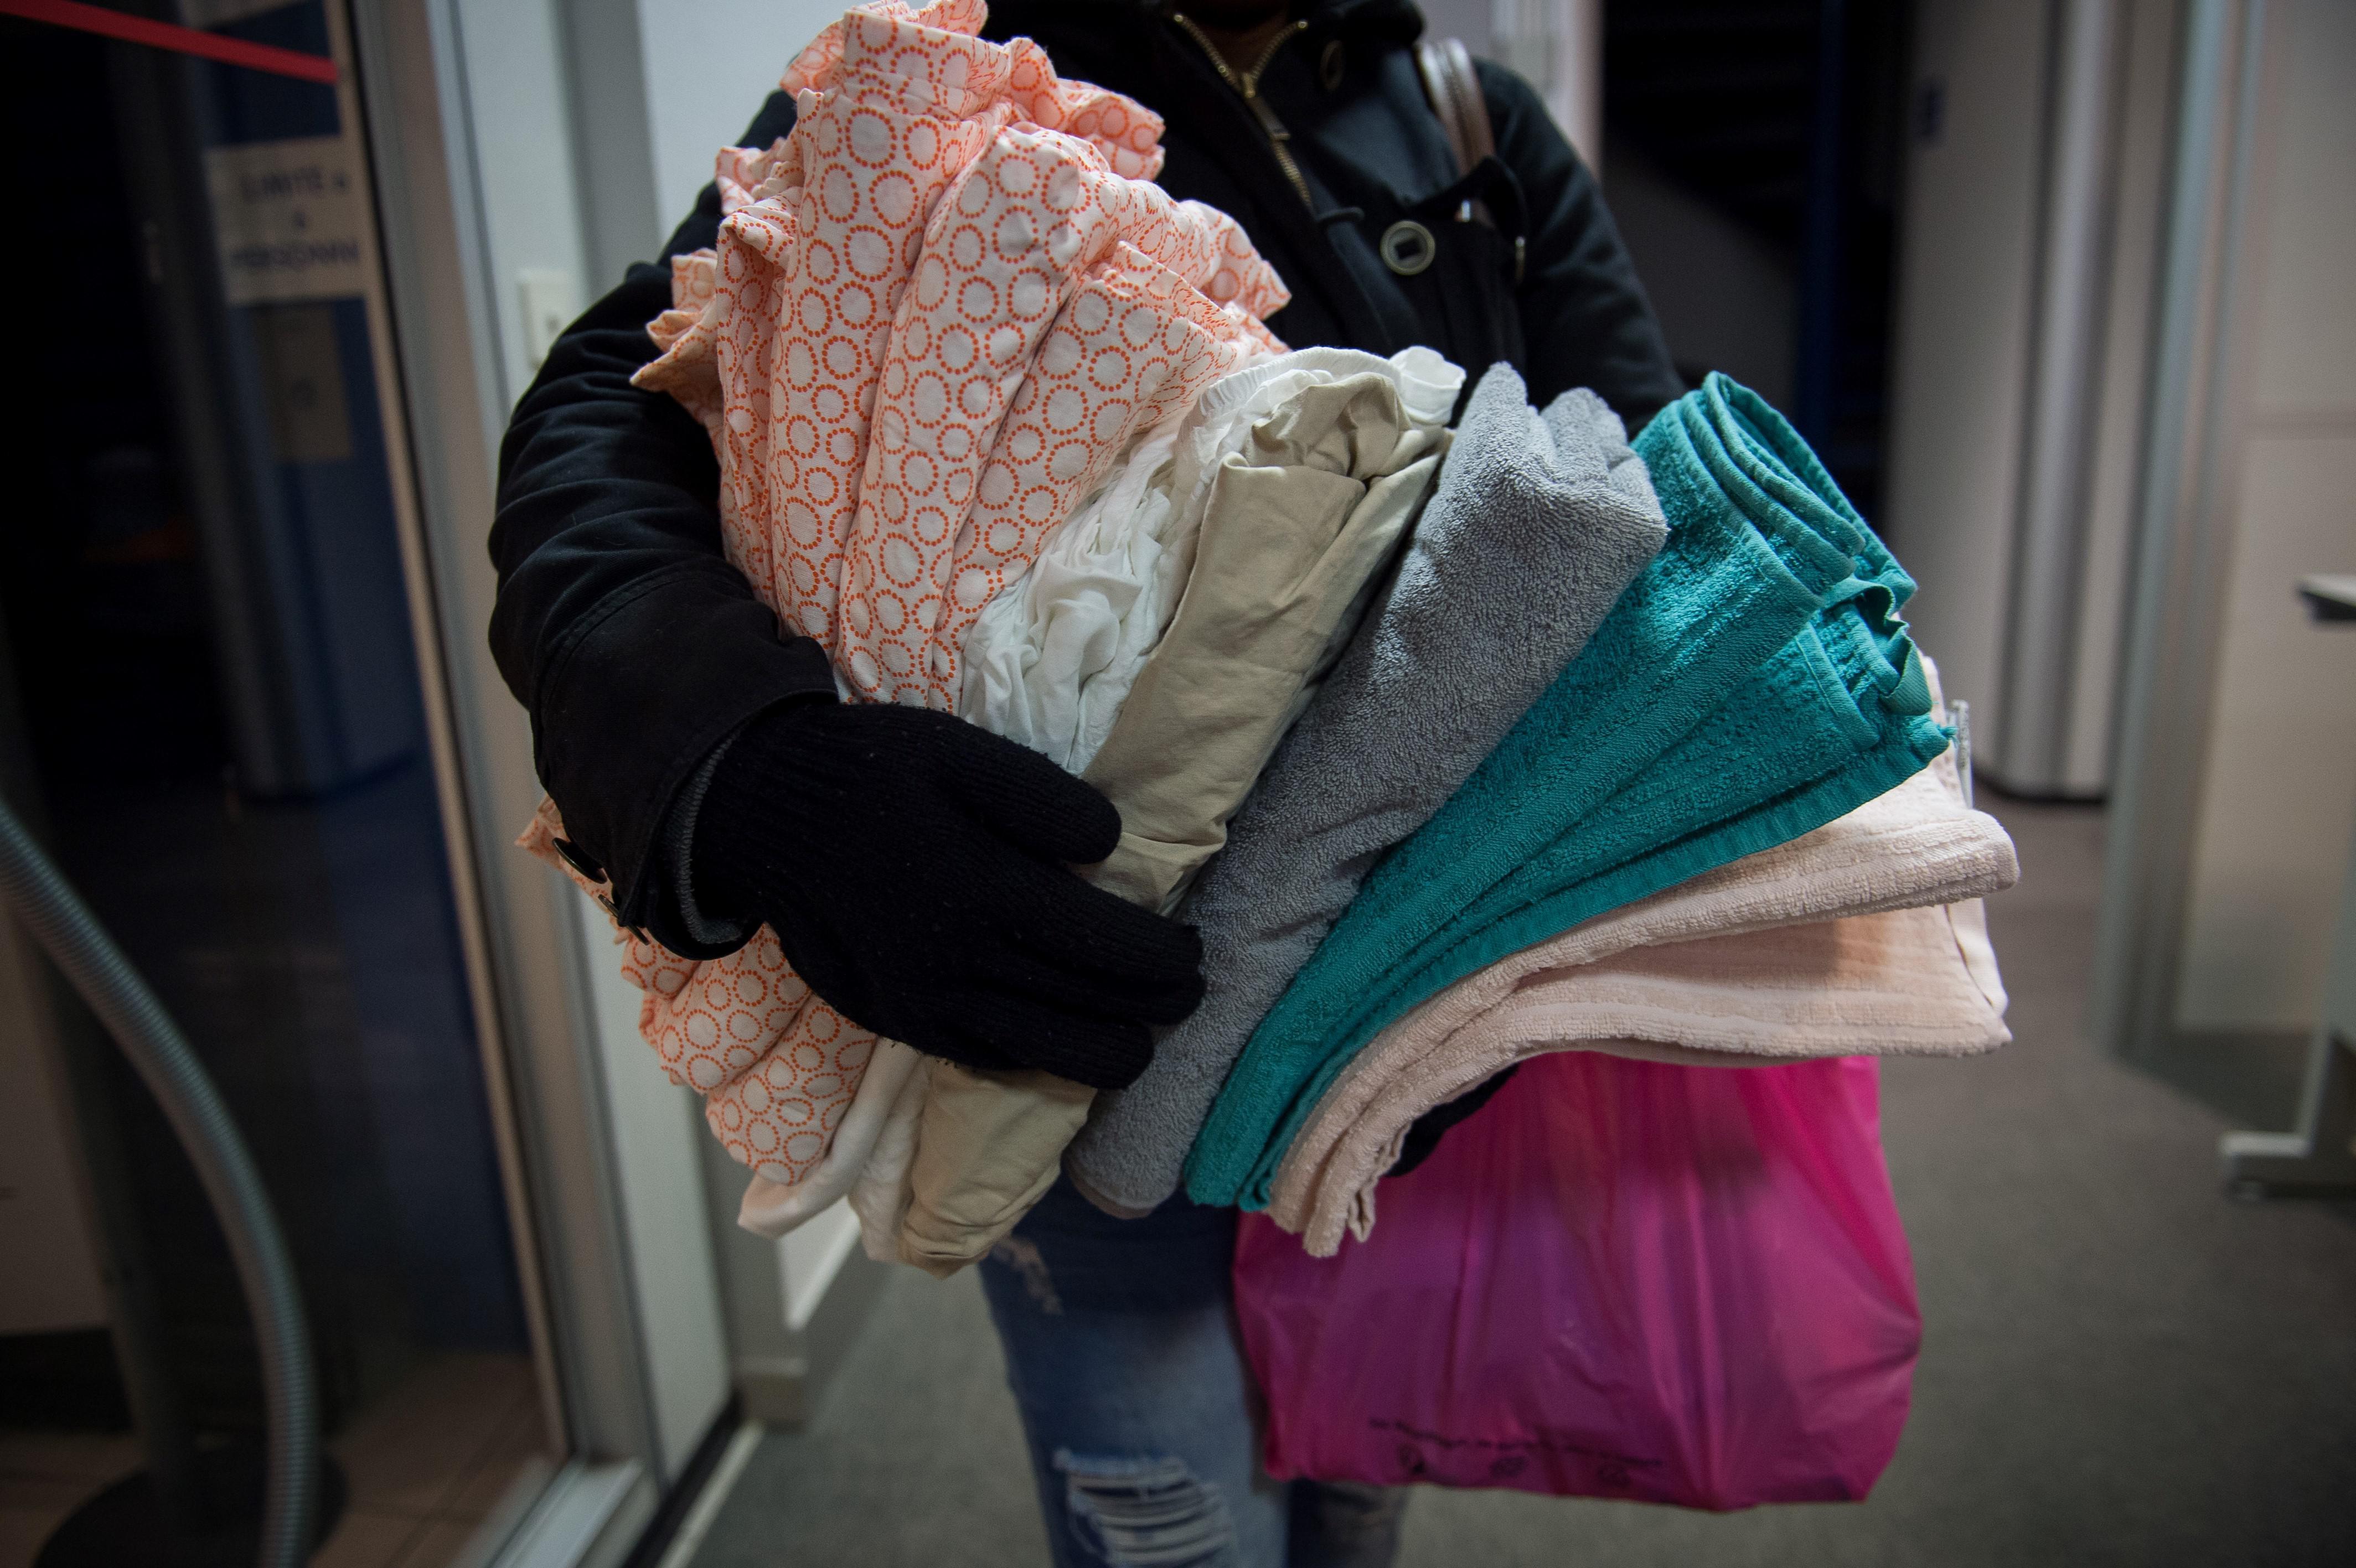 A man holds blankets inside a hosting center of December 18, 2017 in Orleans, central France.